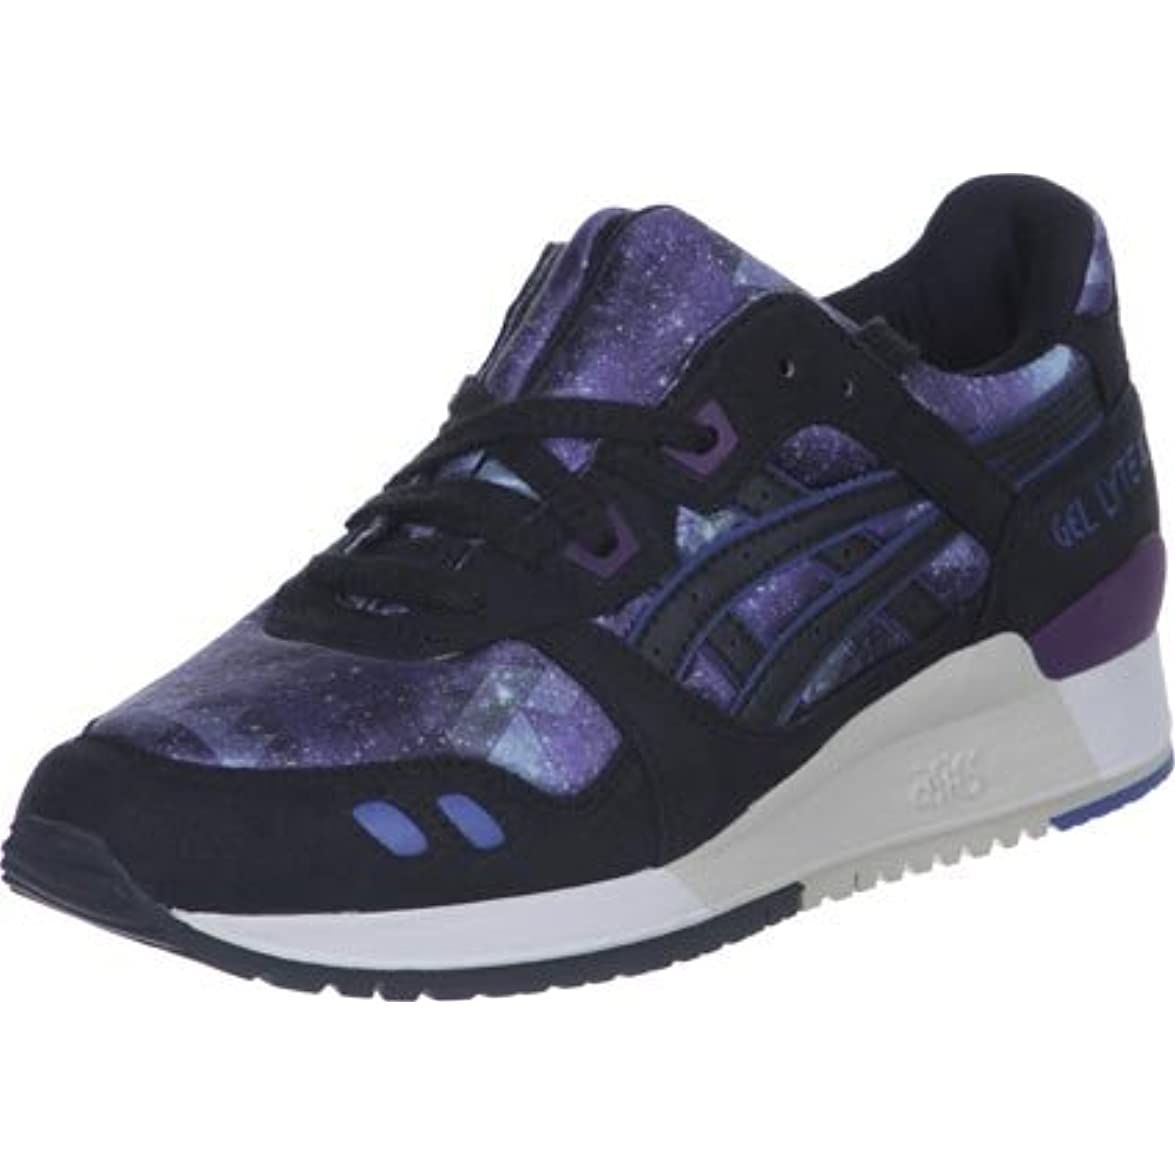 Asics - Gelsaga Sneaker Basse Donna